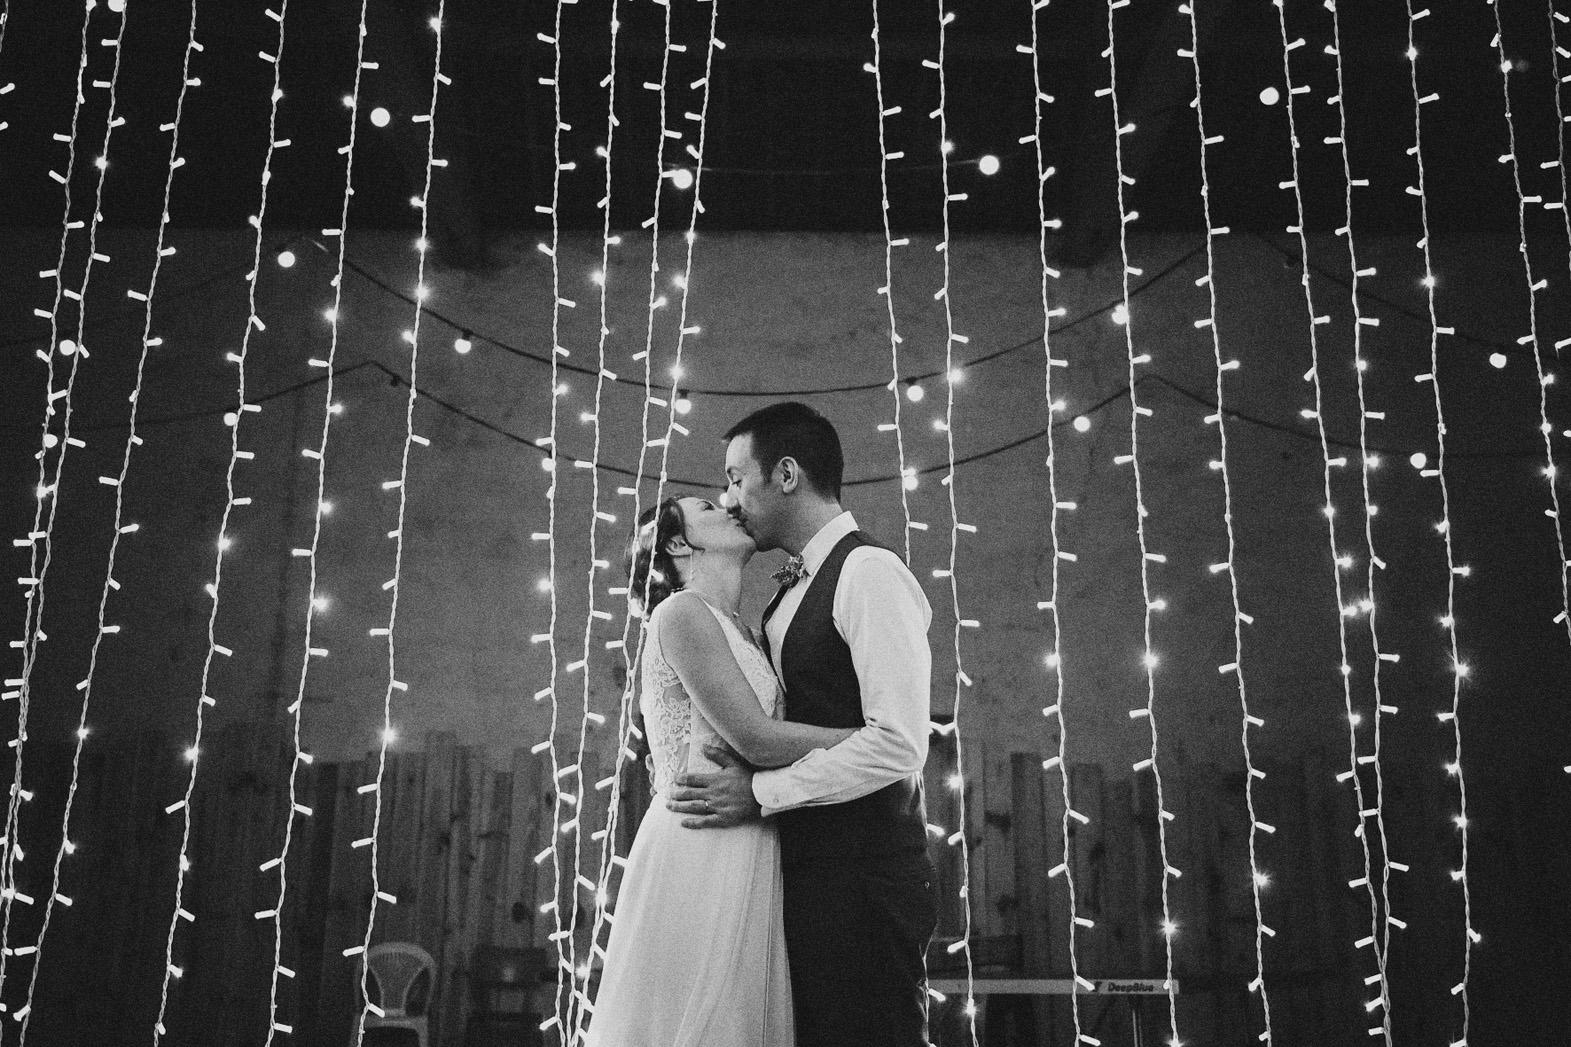 couple mariés devant guirlande lumineuse la nuit